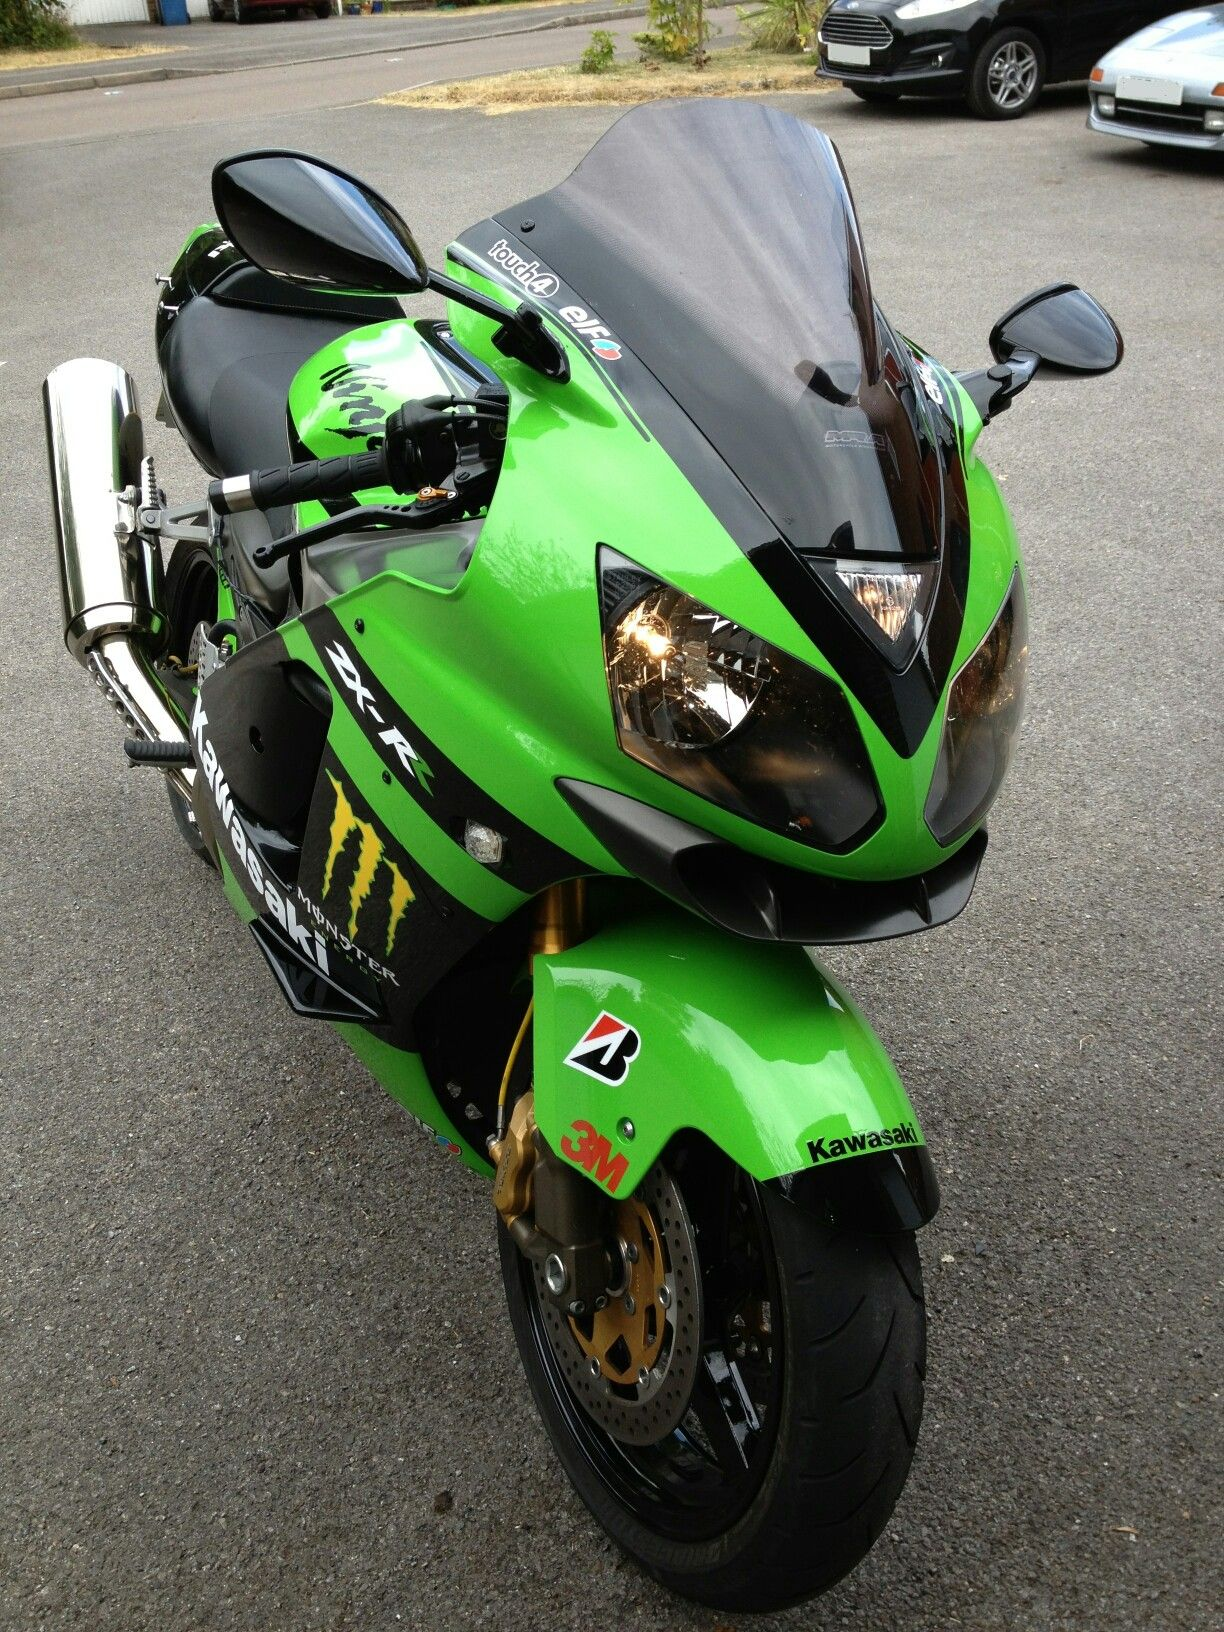 ZX12 motogp tribute   superbike   Kawasaki bikes, Kawasaki